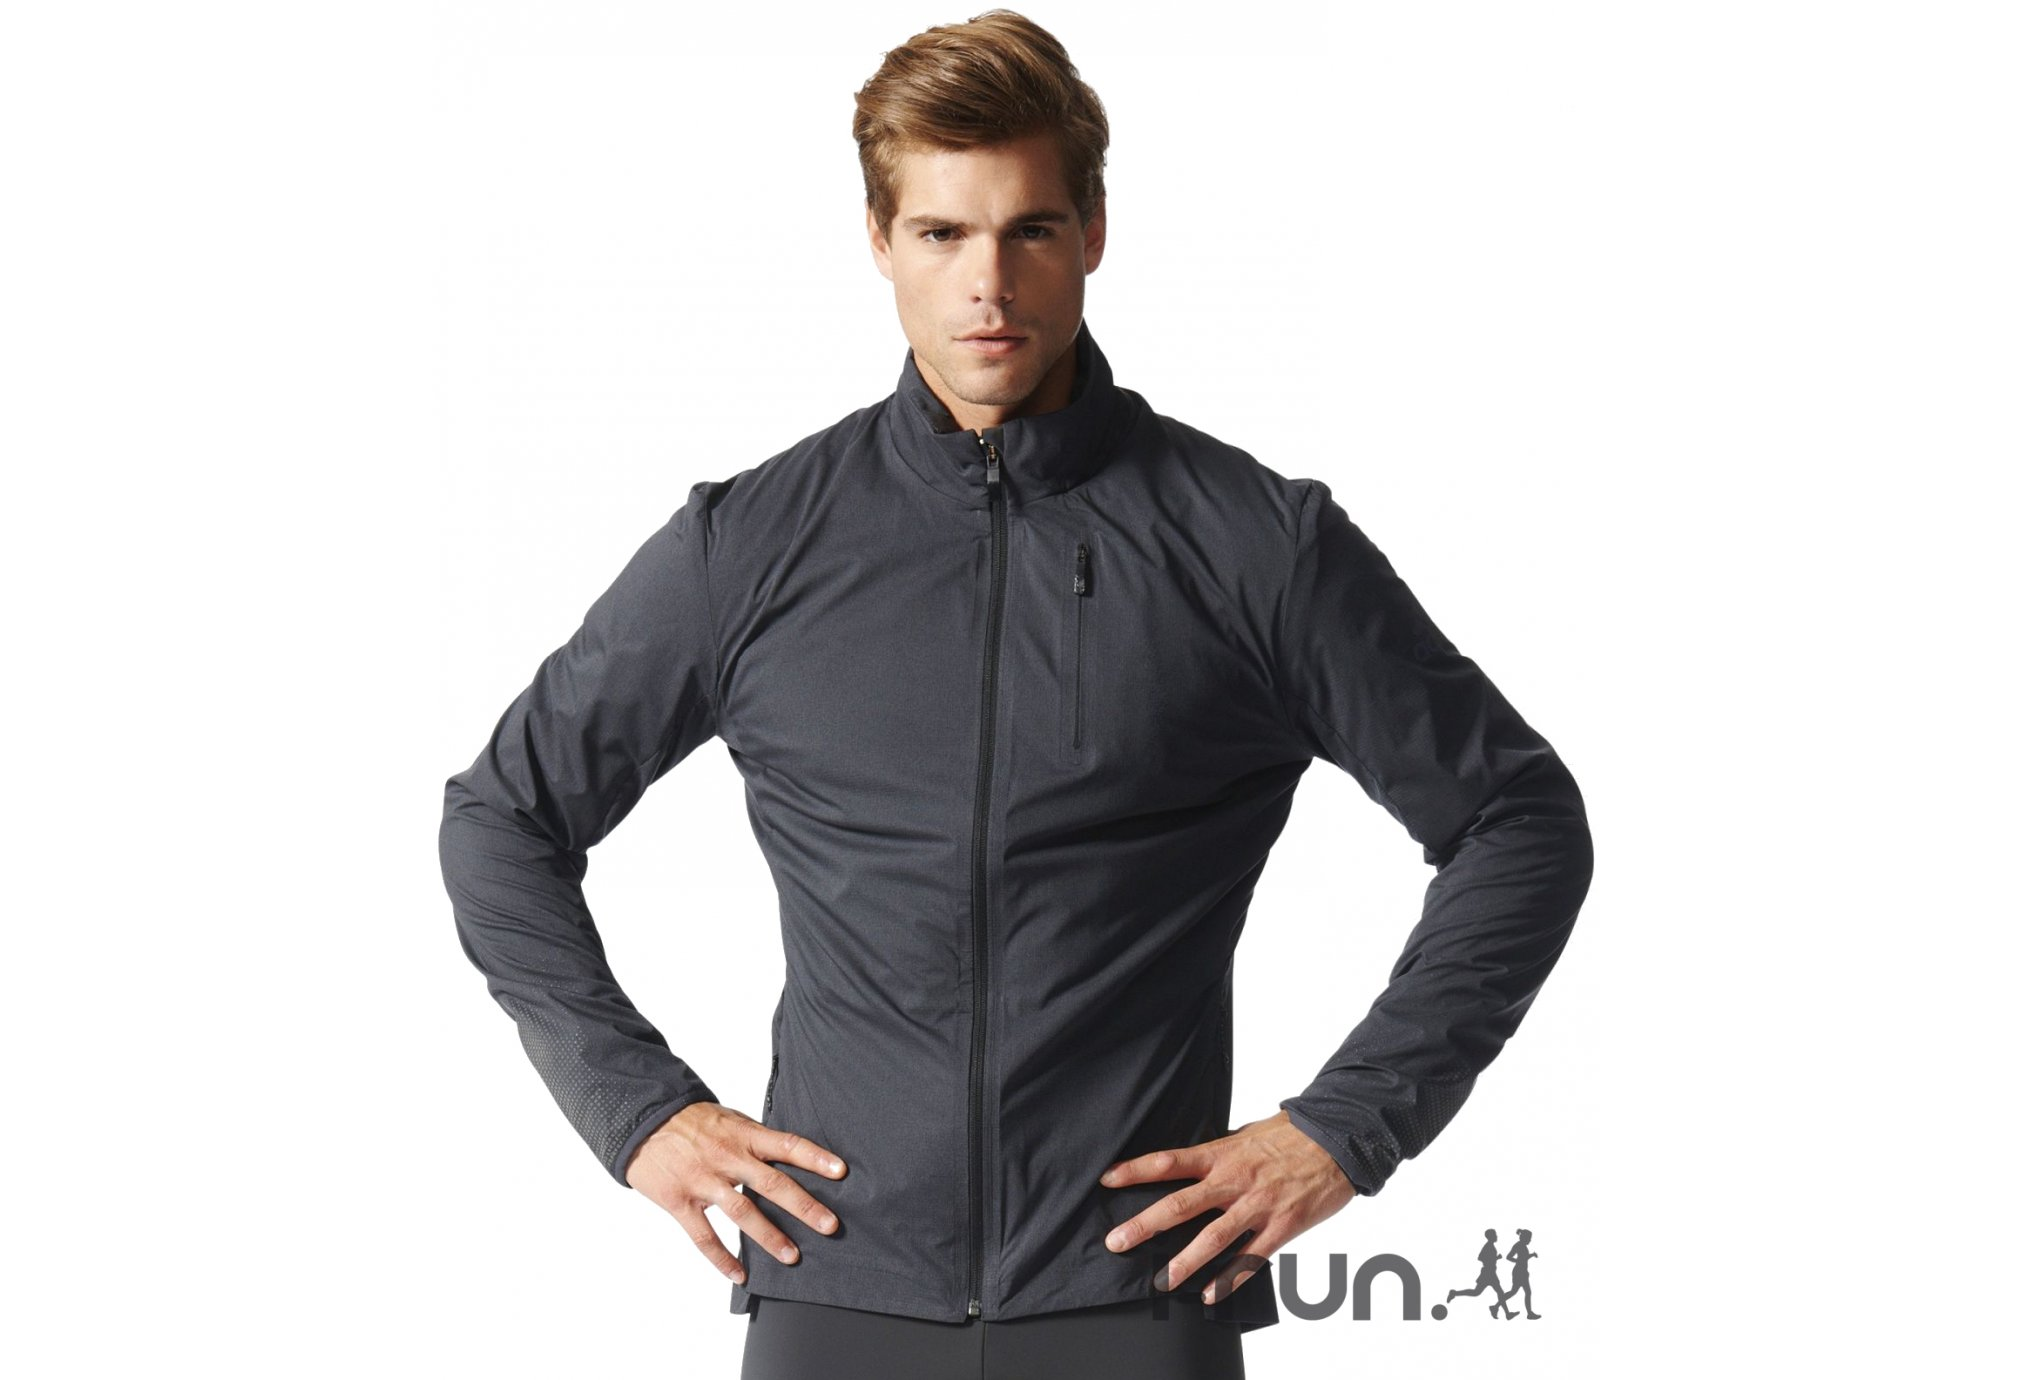 Adidas Climaheat m vêtement running homme